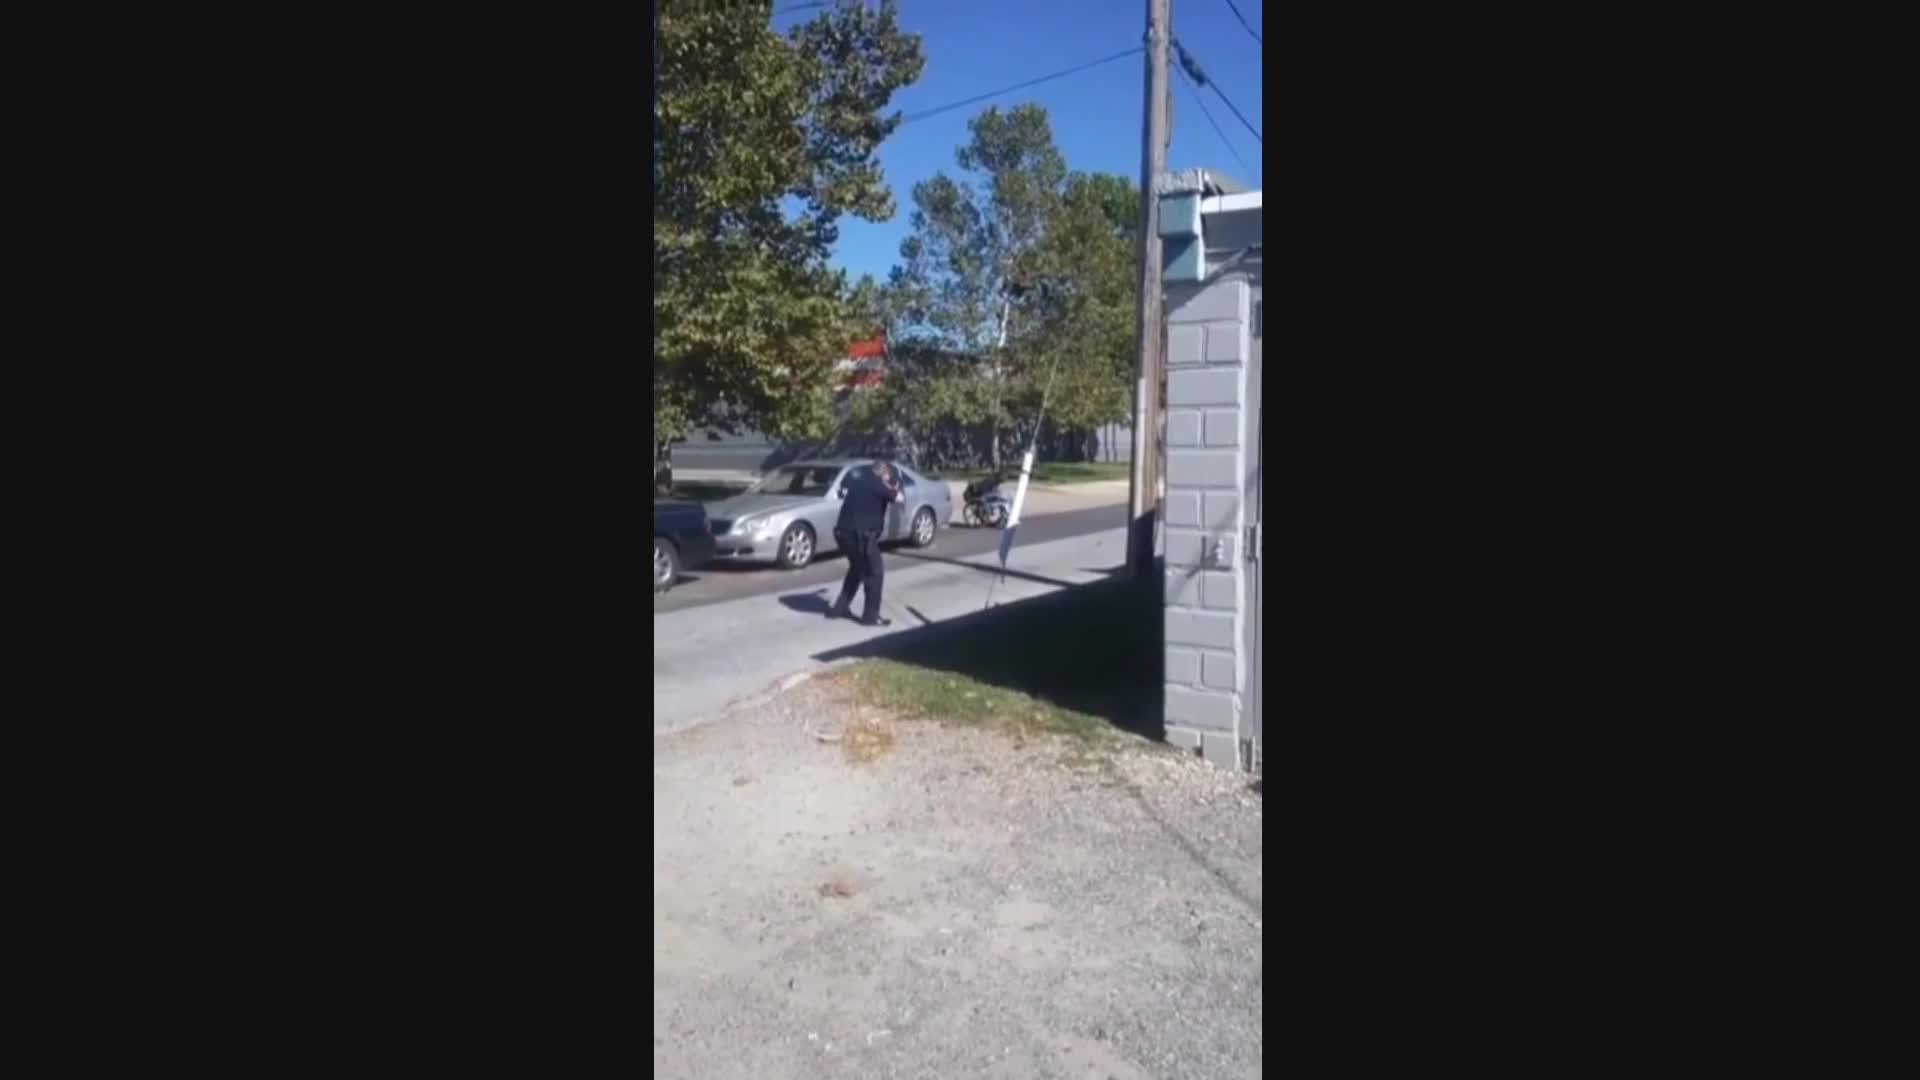 La policía mata a tiros a un hombre en un silla de ruedas en Carolina del Norte